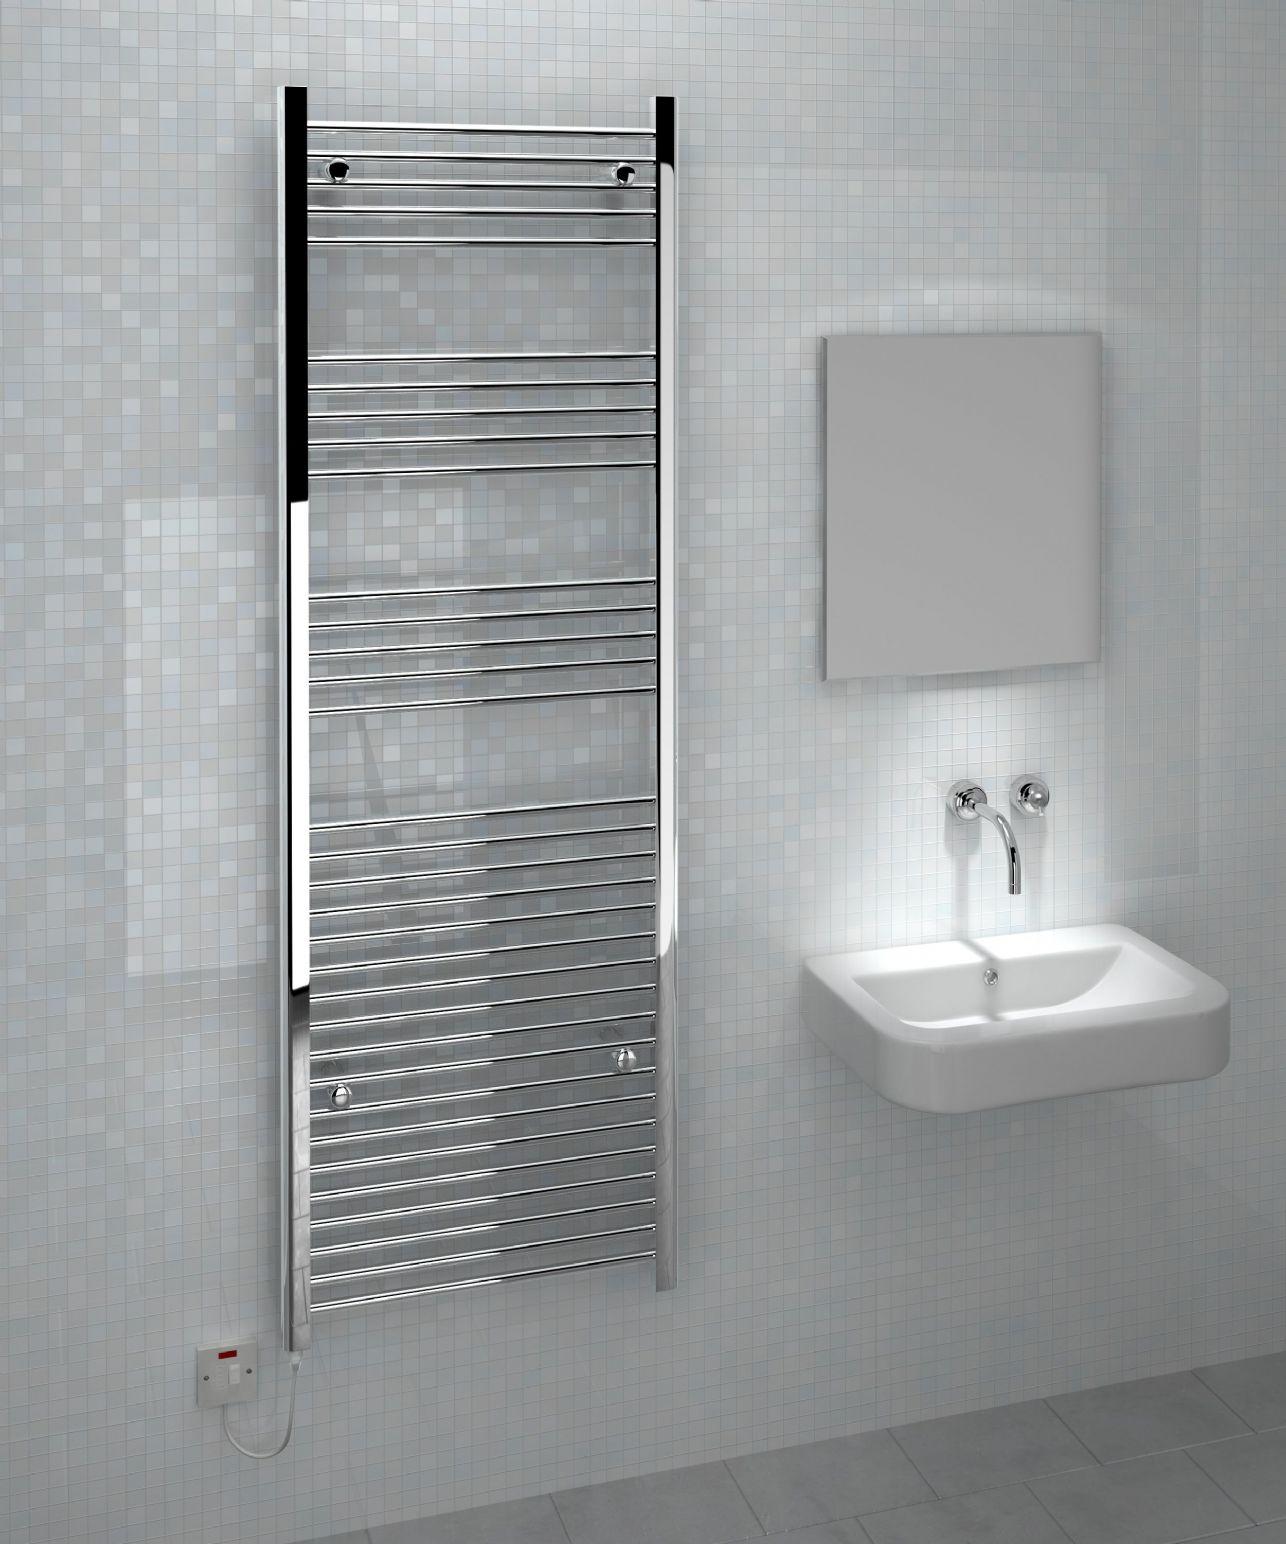 Kudox Flat Electric Towel Radiator: Kudox Large Electric Towel Rail Chrome 600W (600 X 1800mm